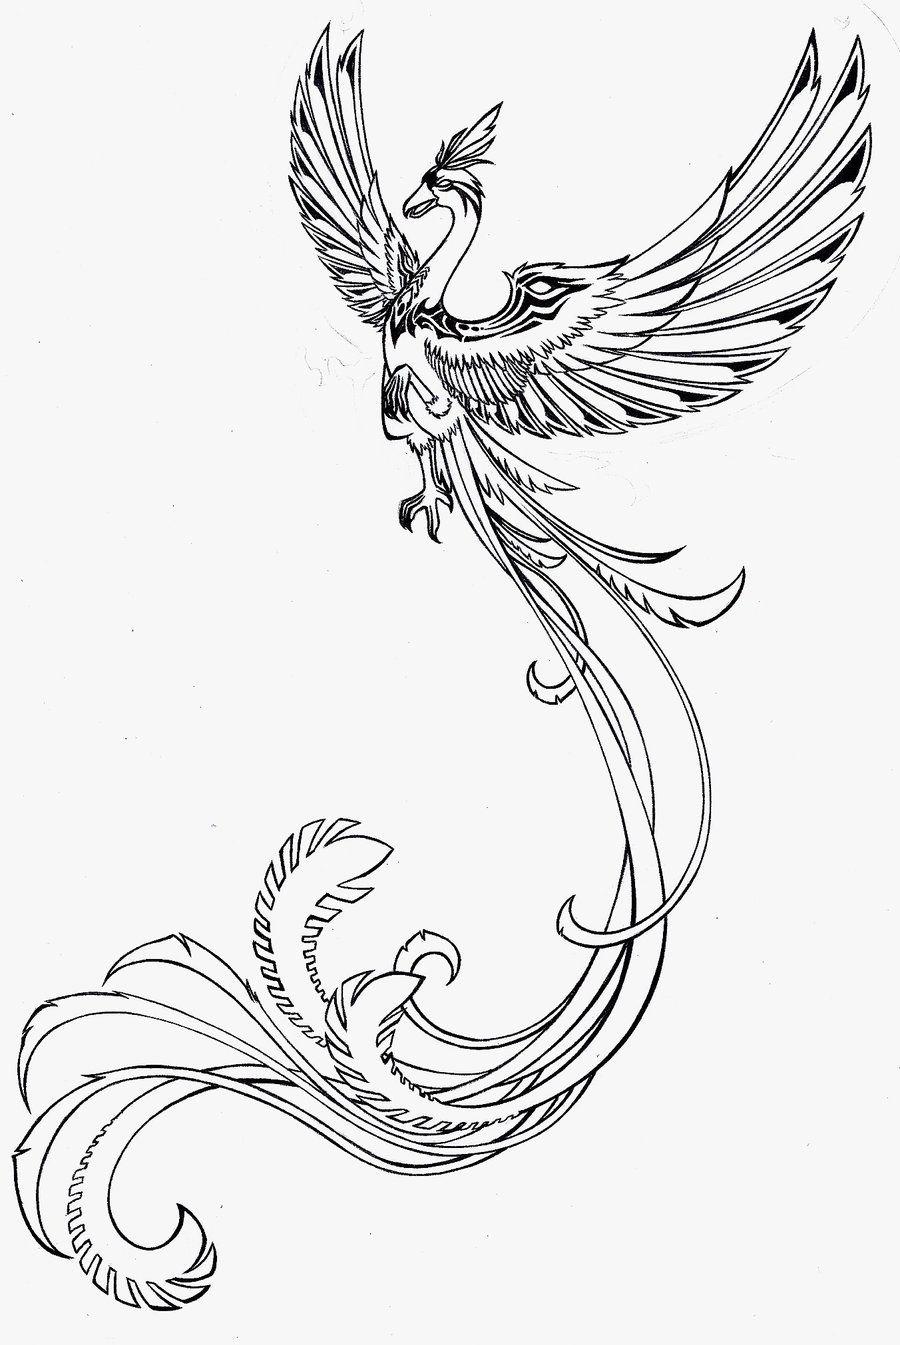 phoenix+drawings | Phoenix drawings | drawing ideas ...